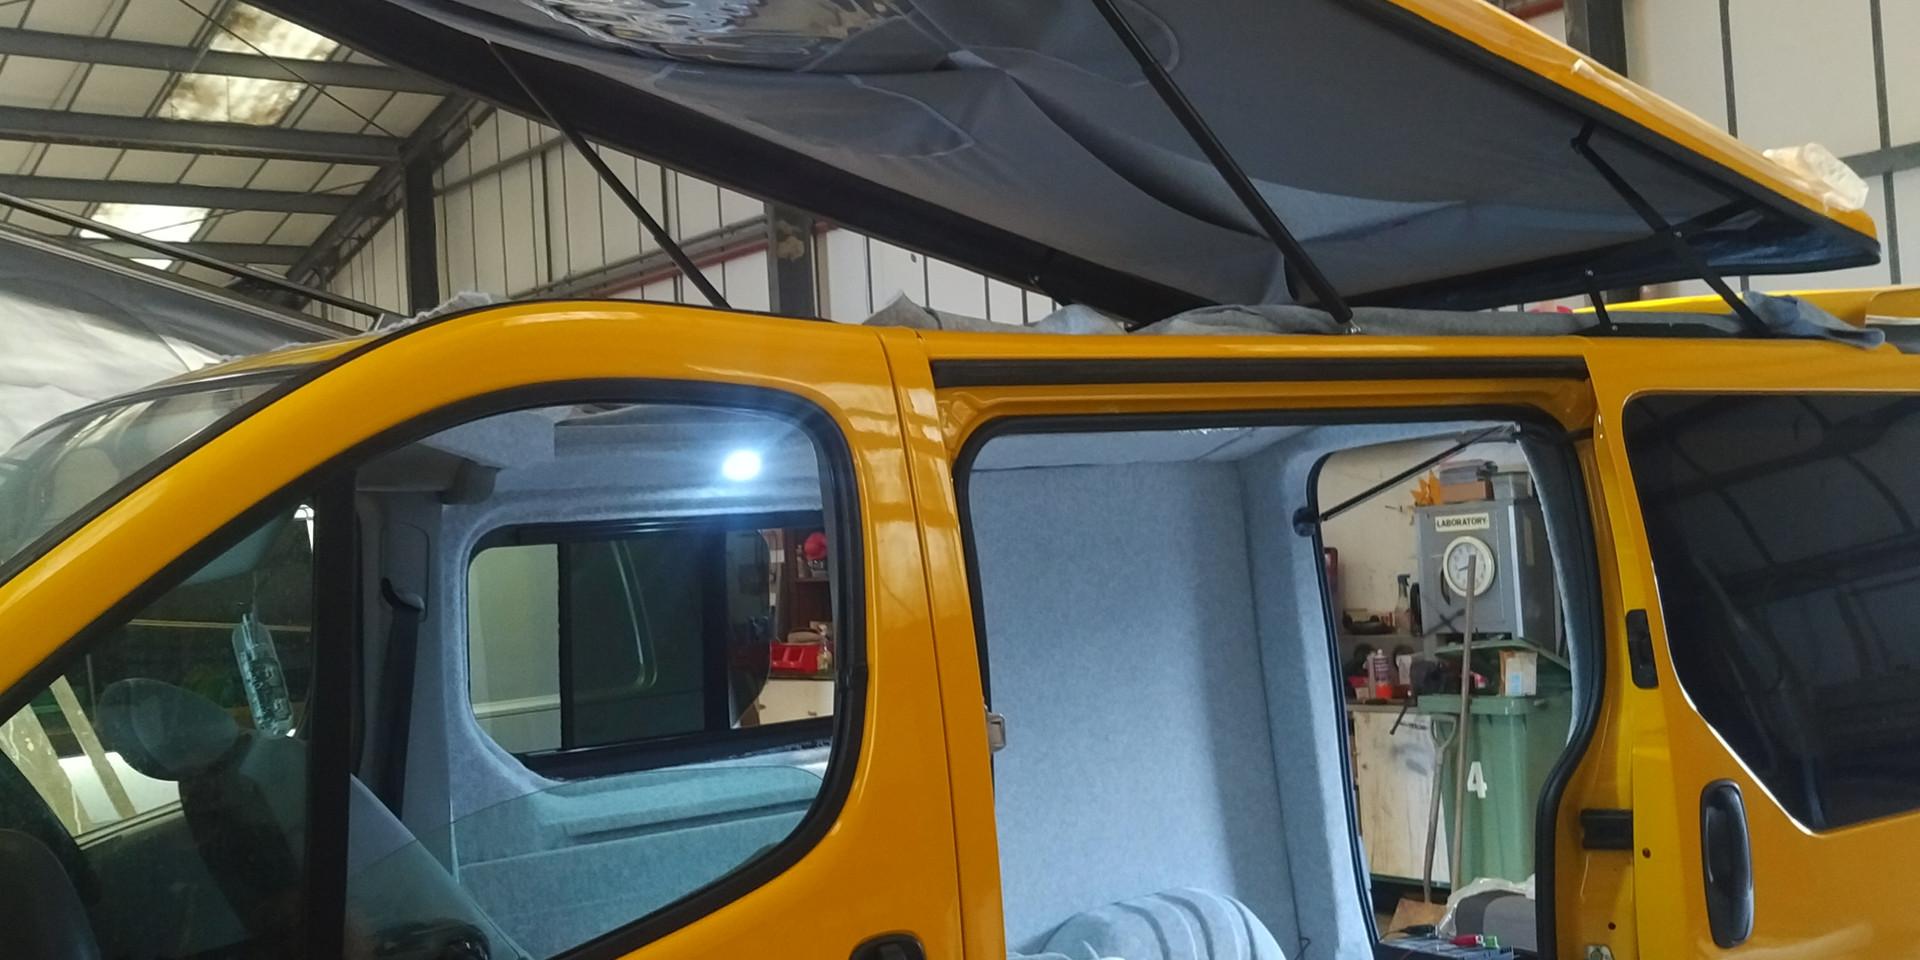 Vauxhall Vivaro - Bumble Bee-3.jpg